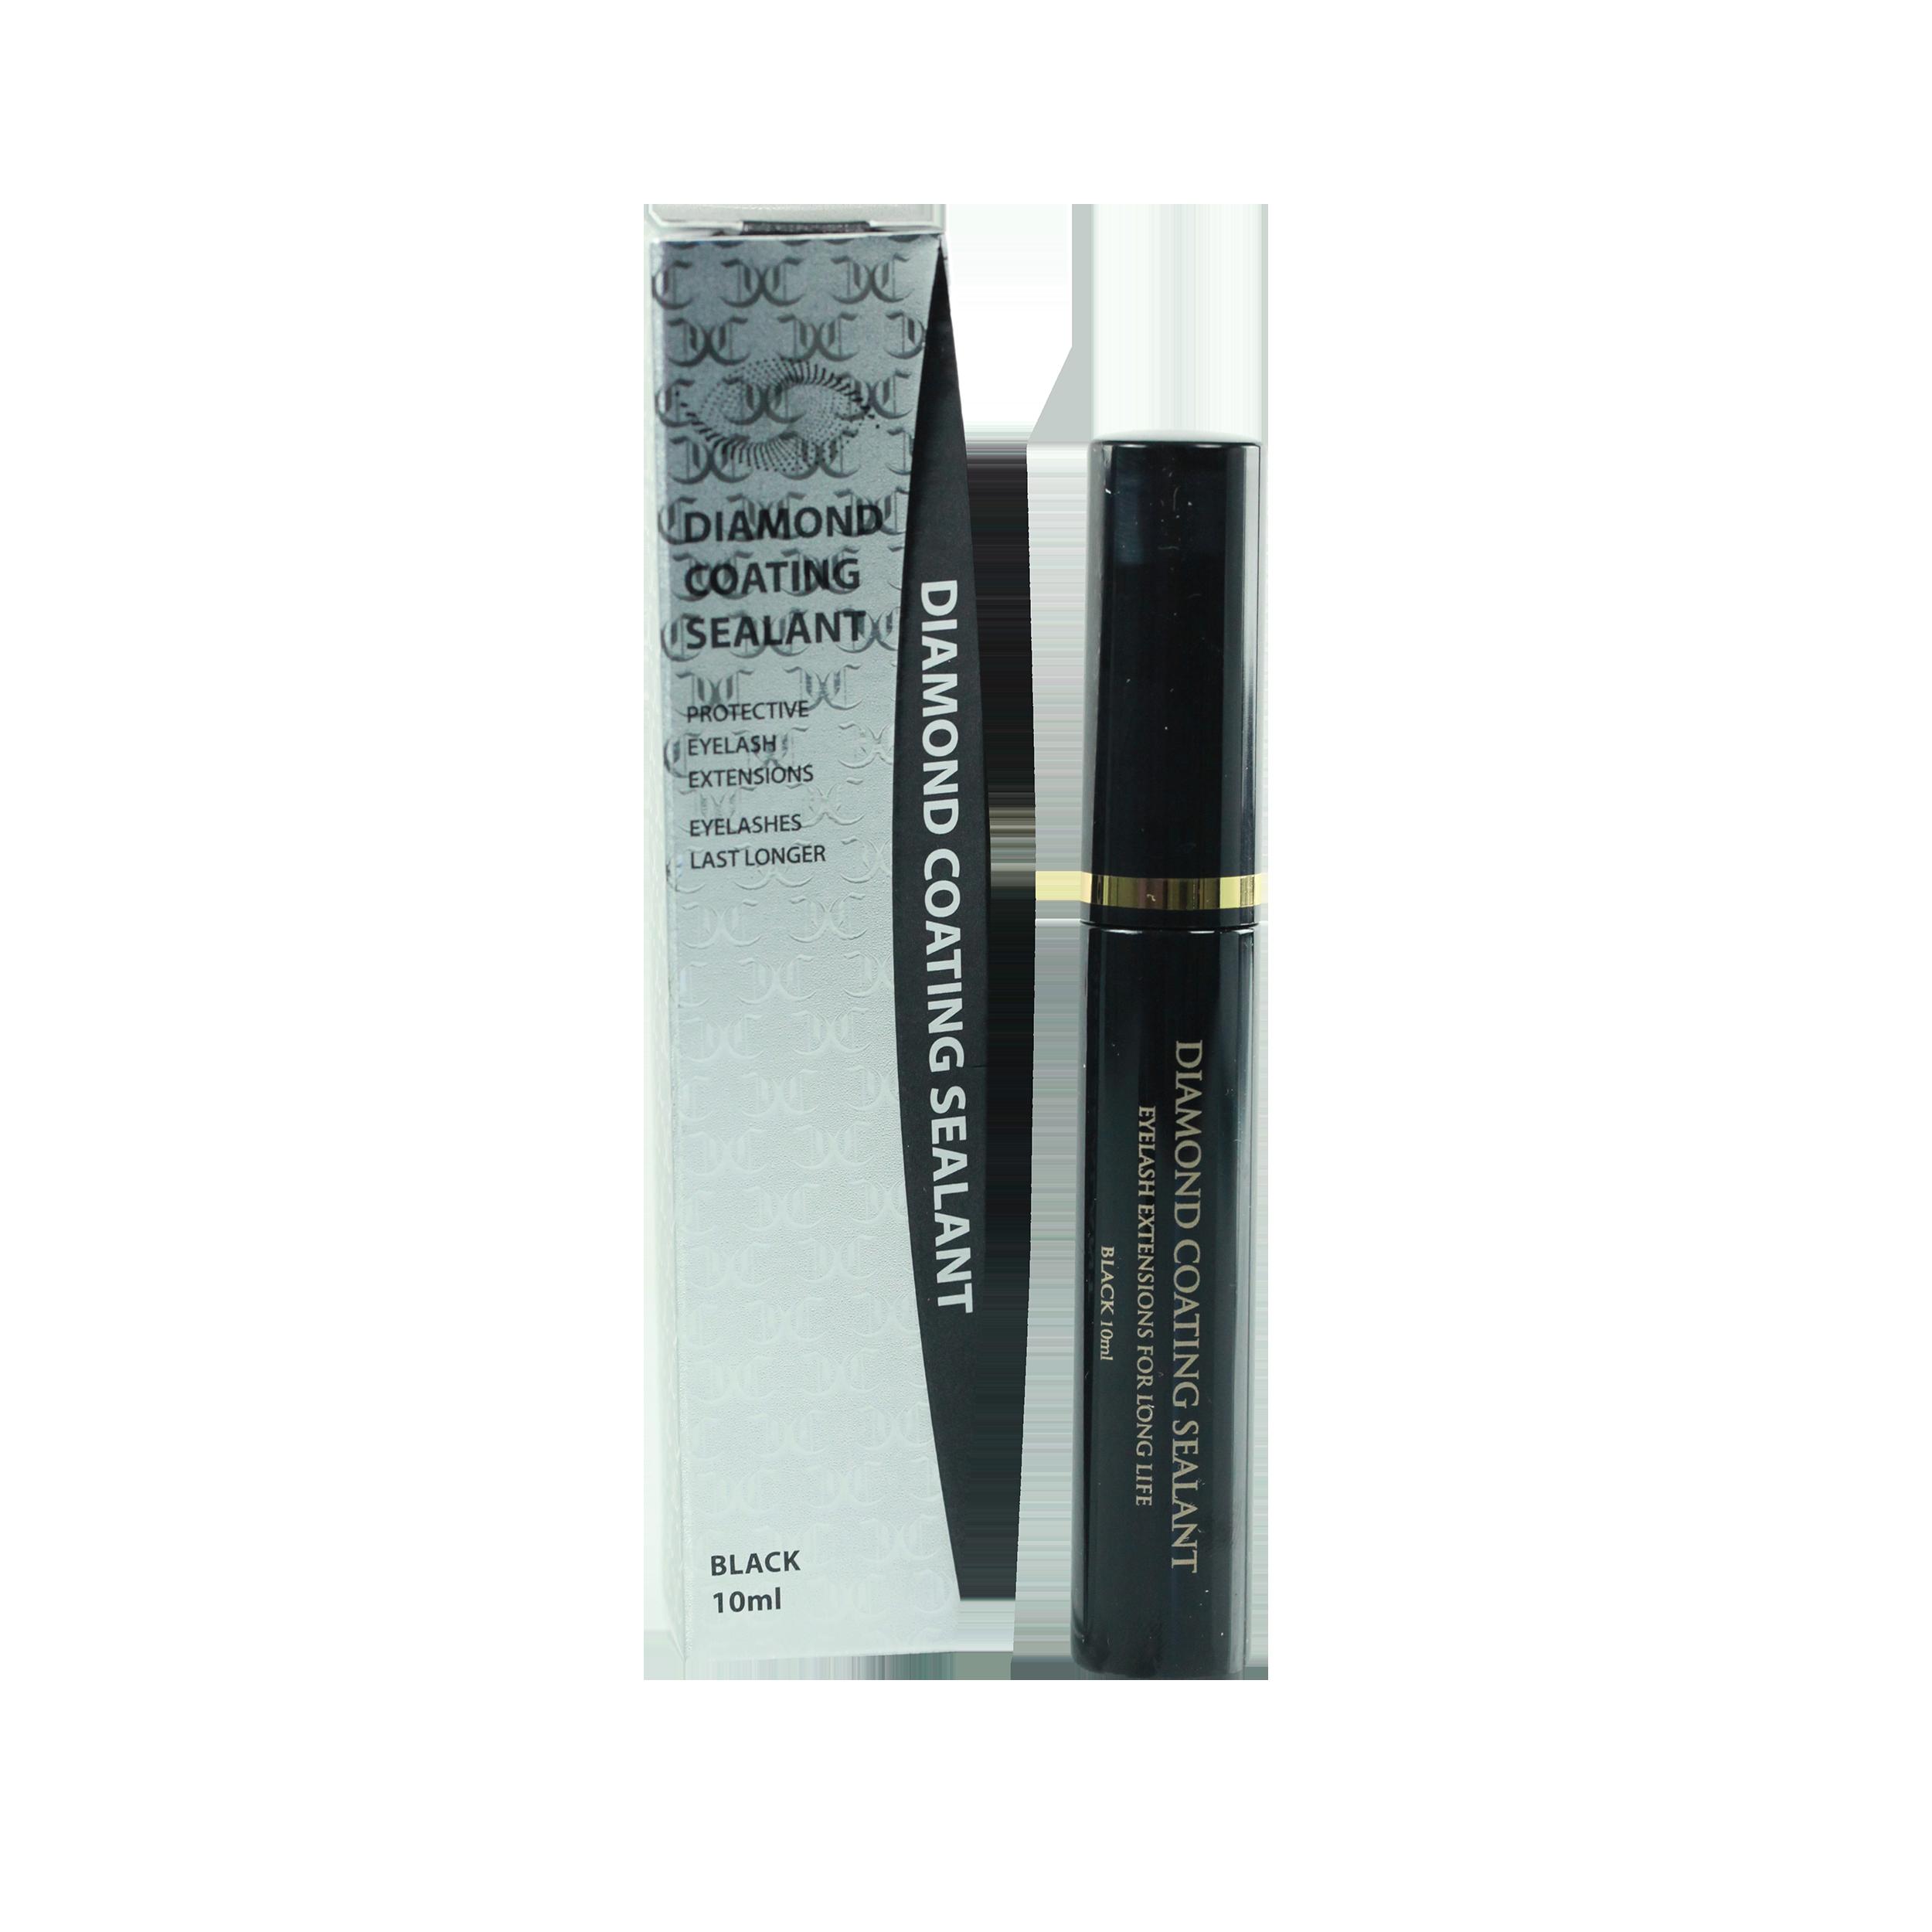 04659 - Lash Coating Mascara & Continuance BLACK  10 ml